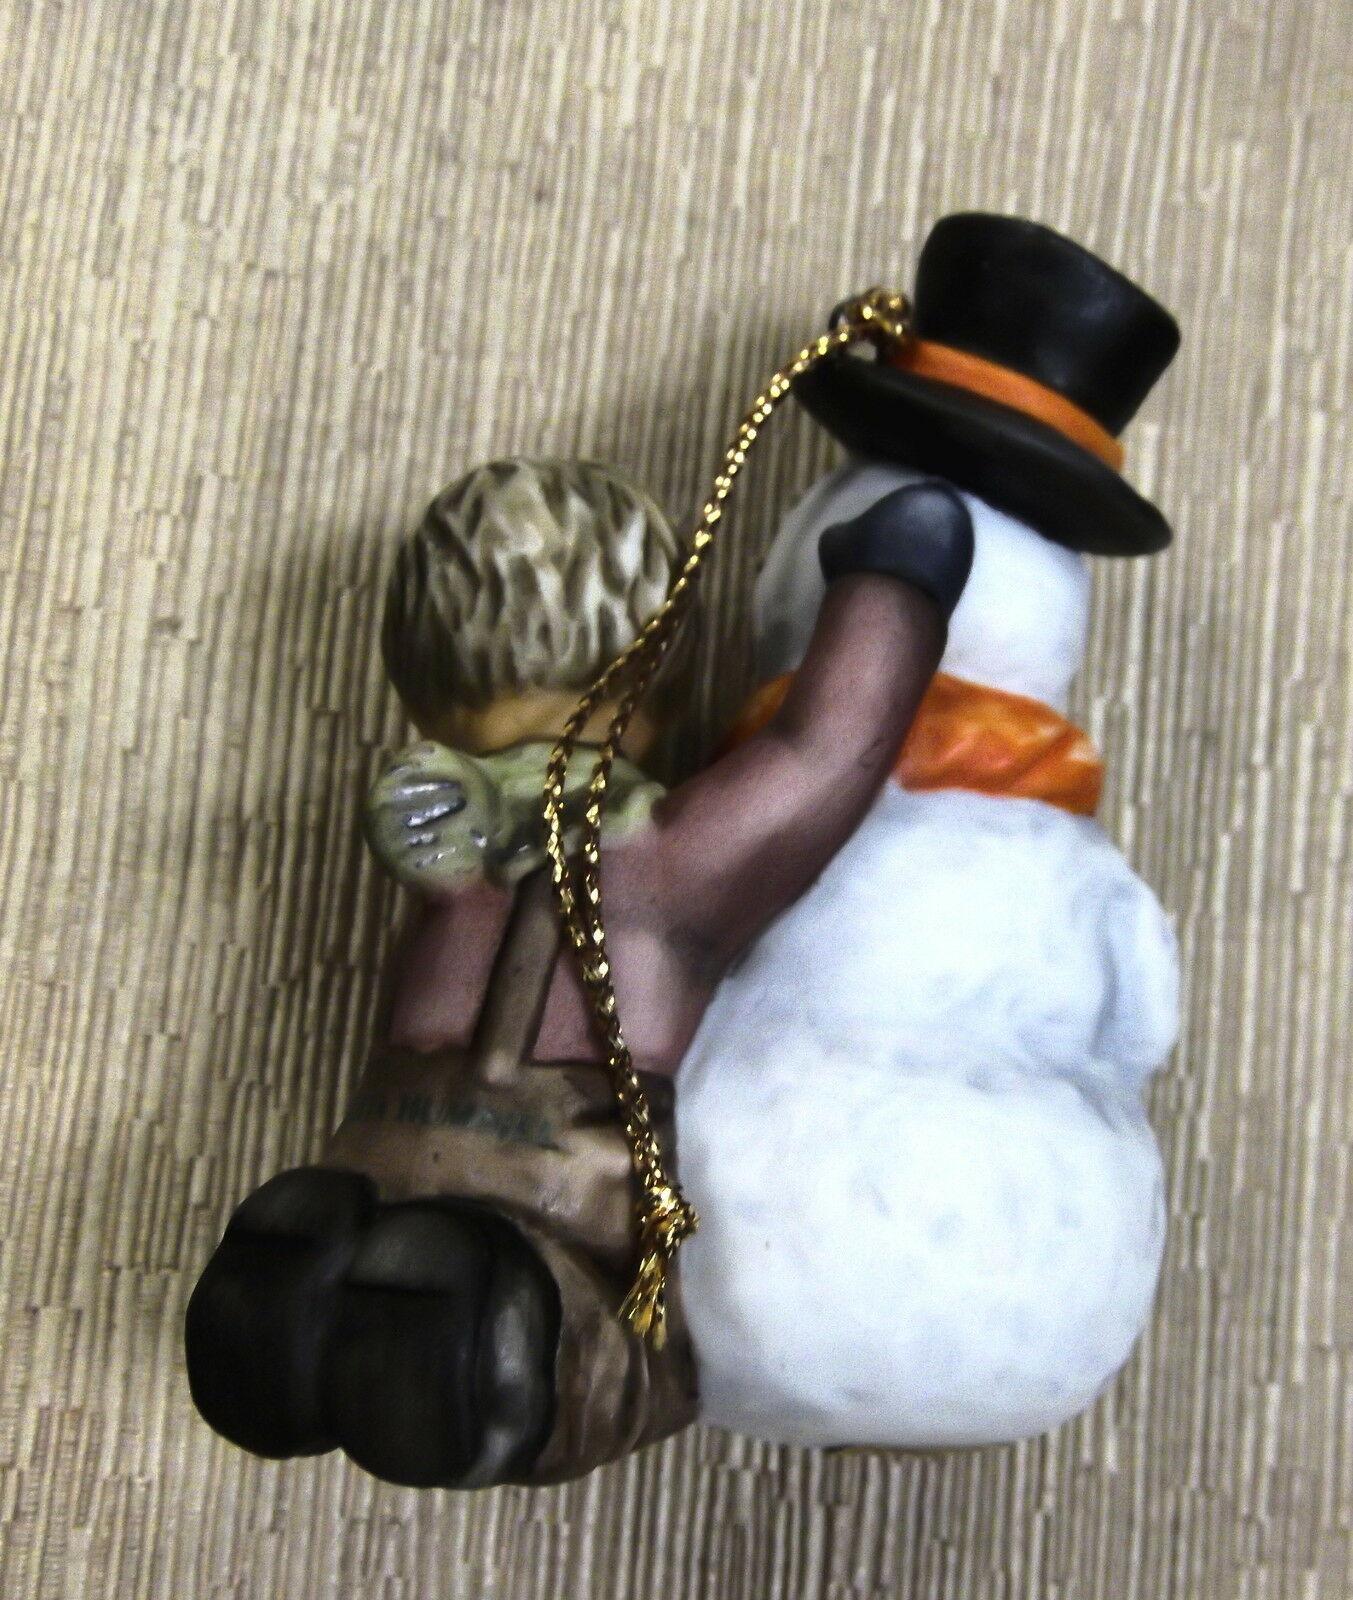 Goebel Berta Hummel My First Snowman Ornament #935121